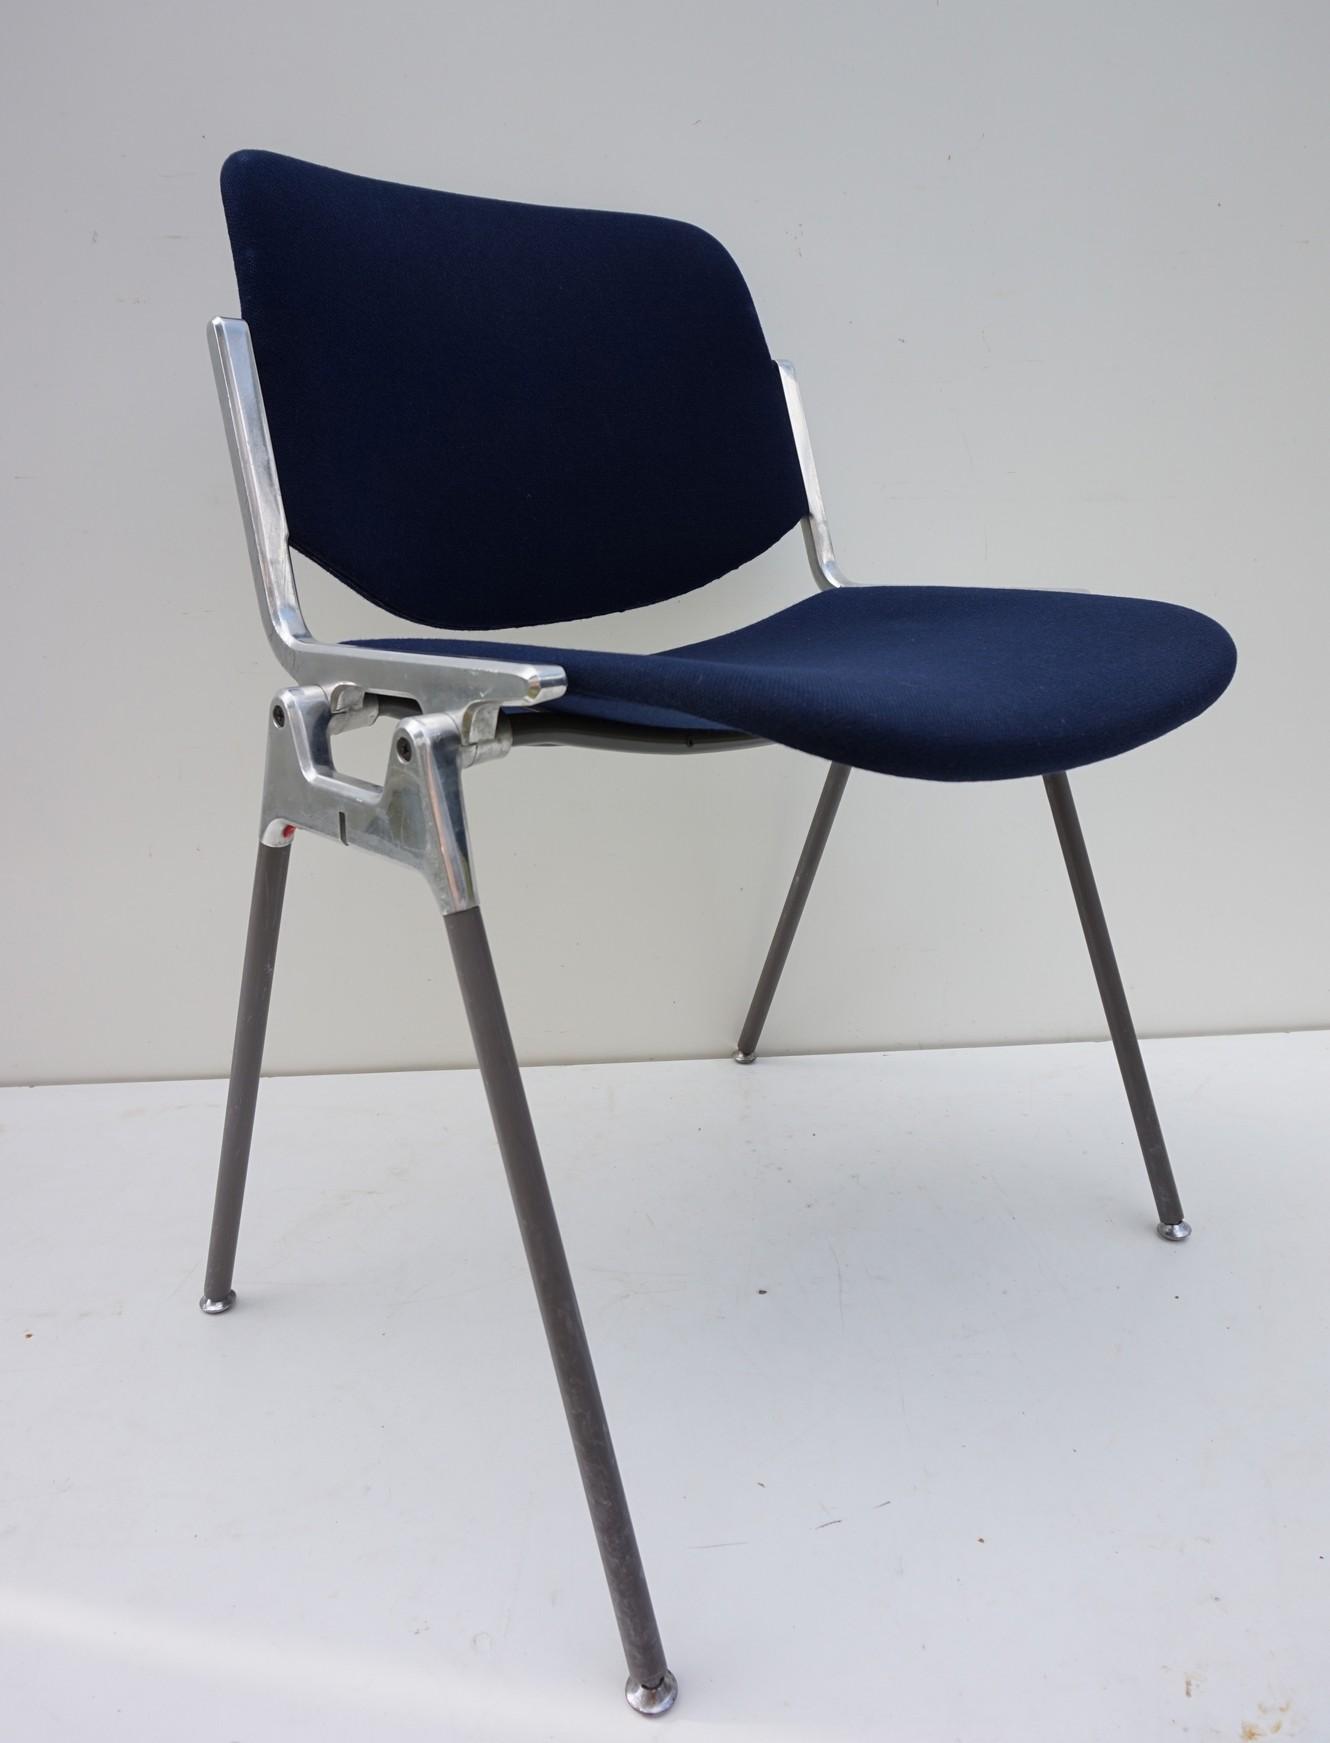 Giancarlo Piretti Design.Dsc 106 Chairs By Giancarlo Piretti For Castelli